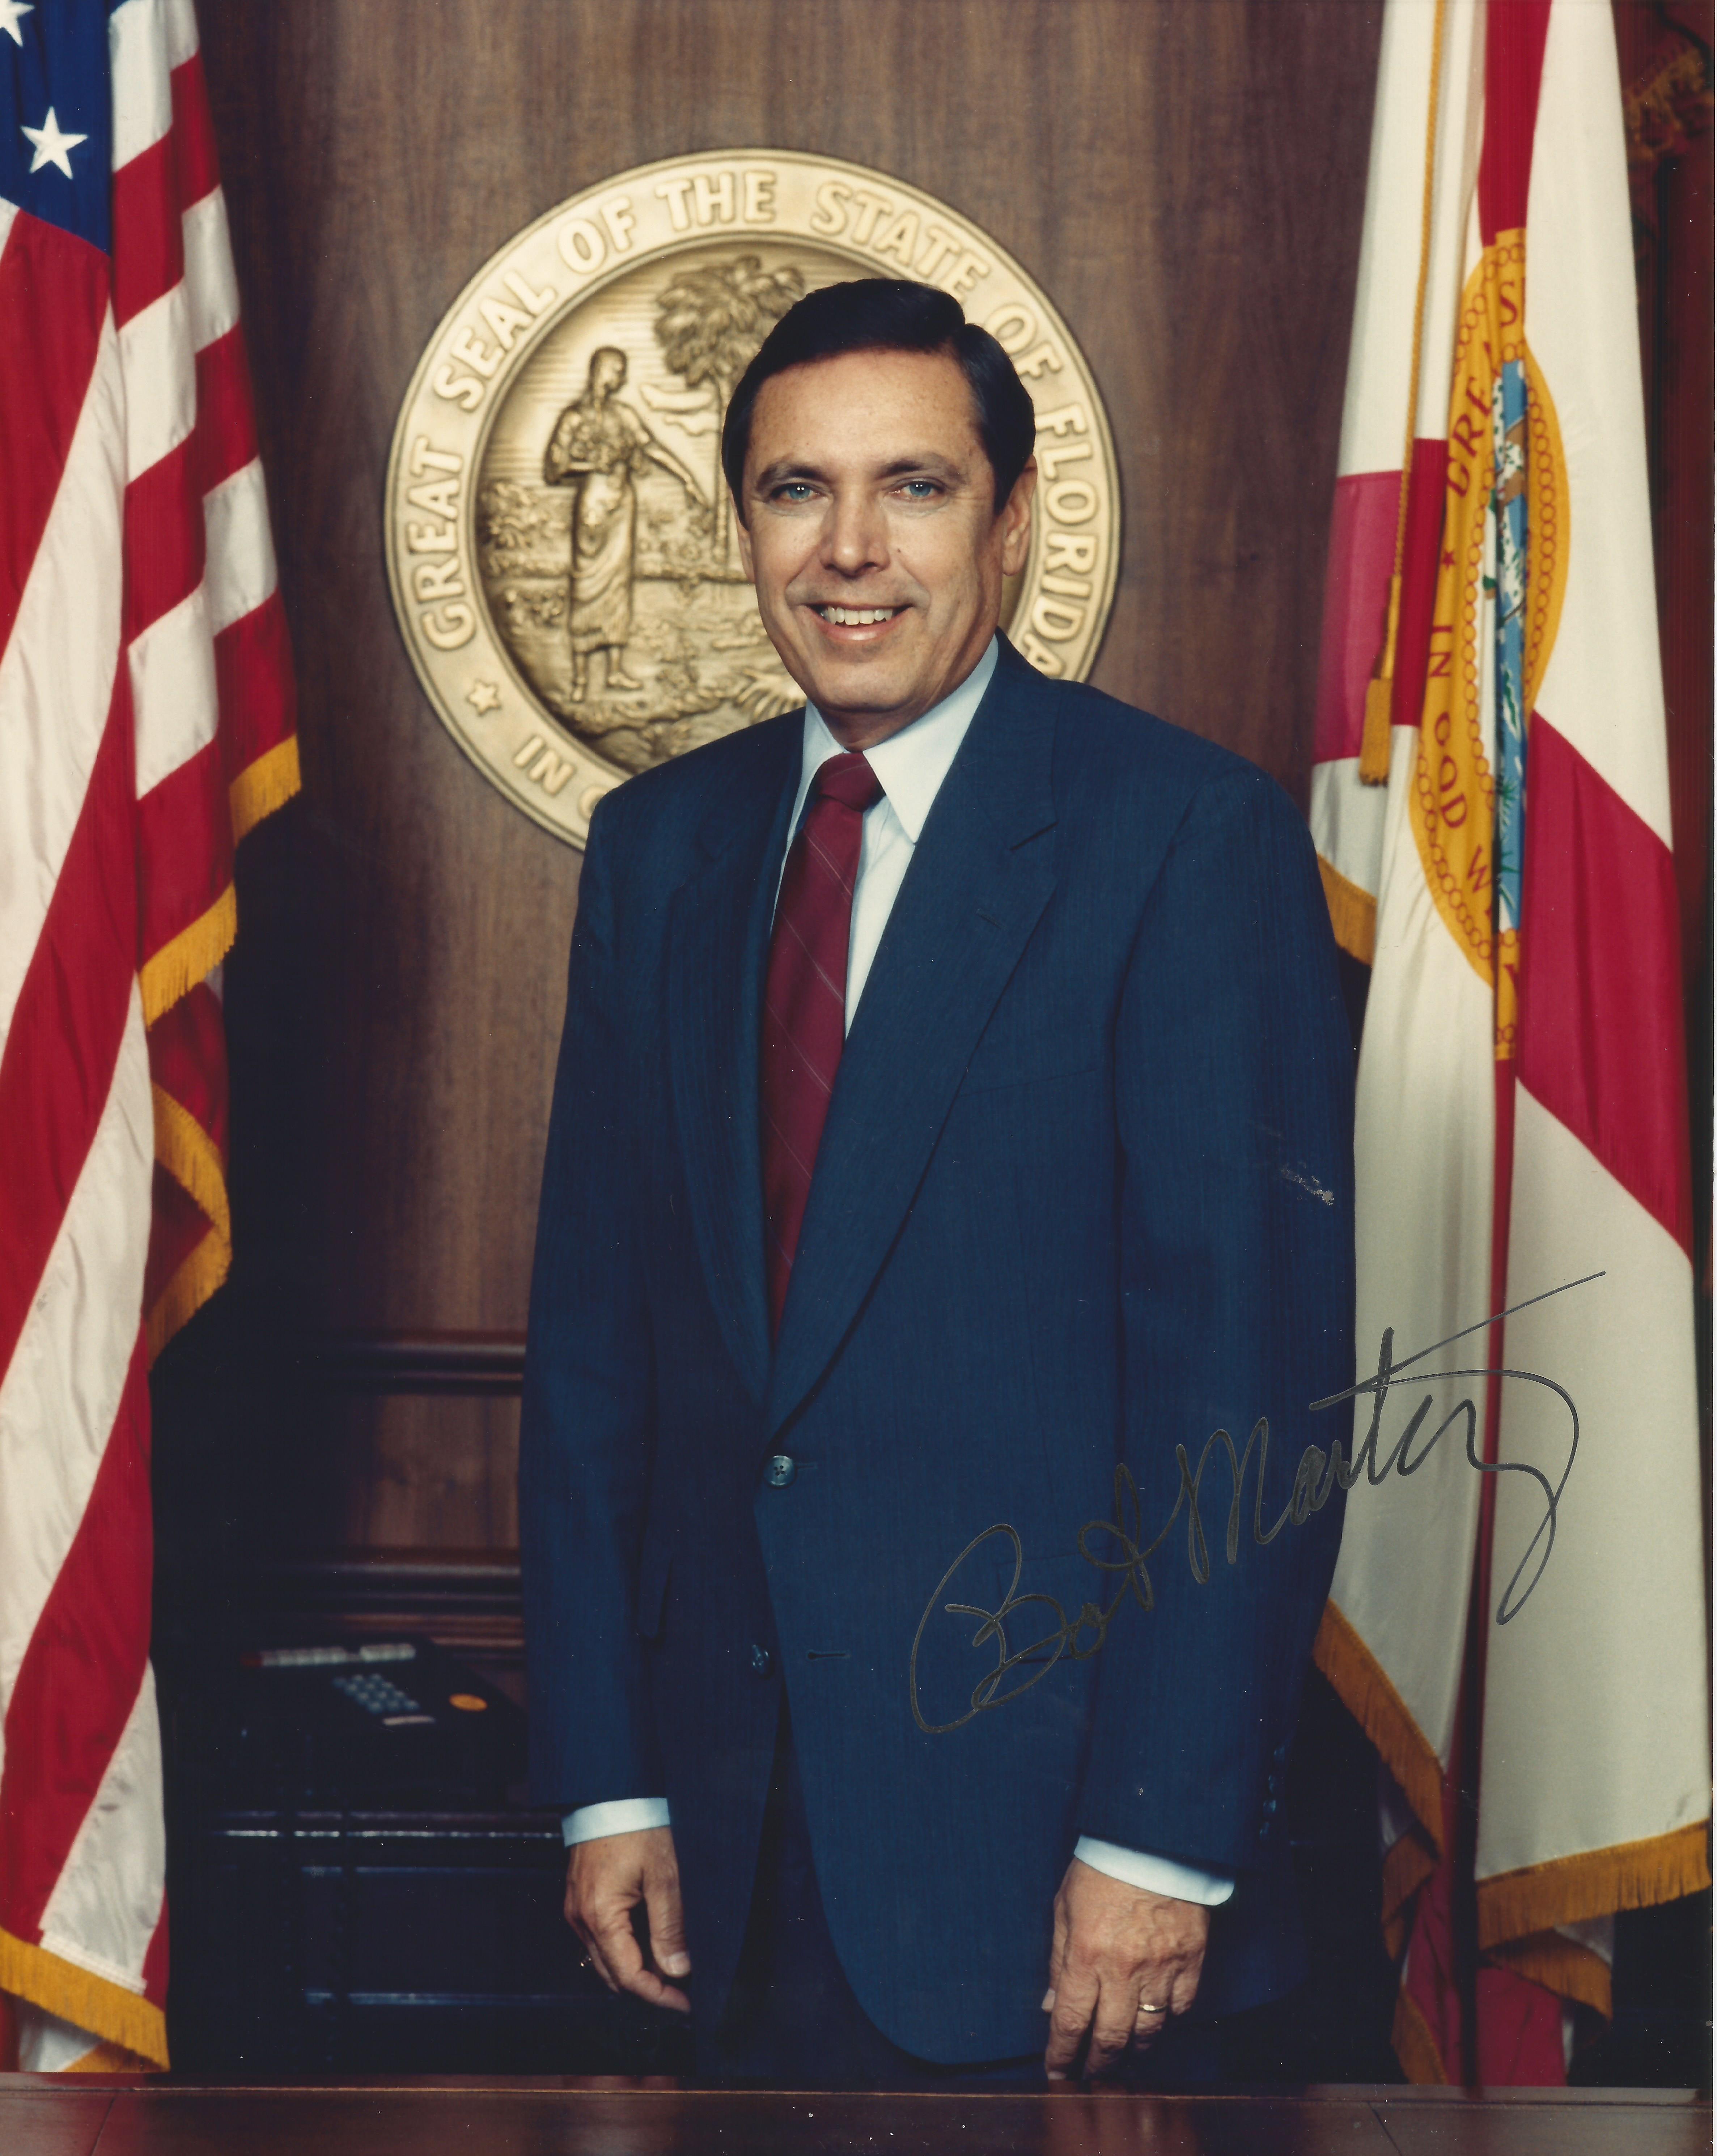 FL Gov Bob Martinez signed photo